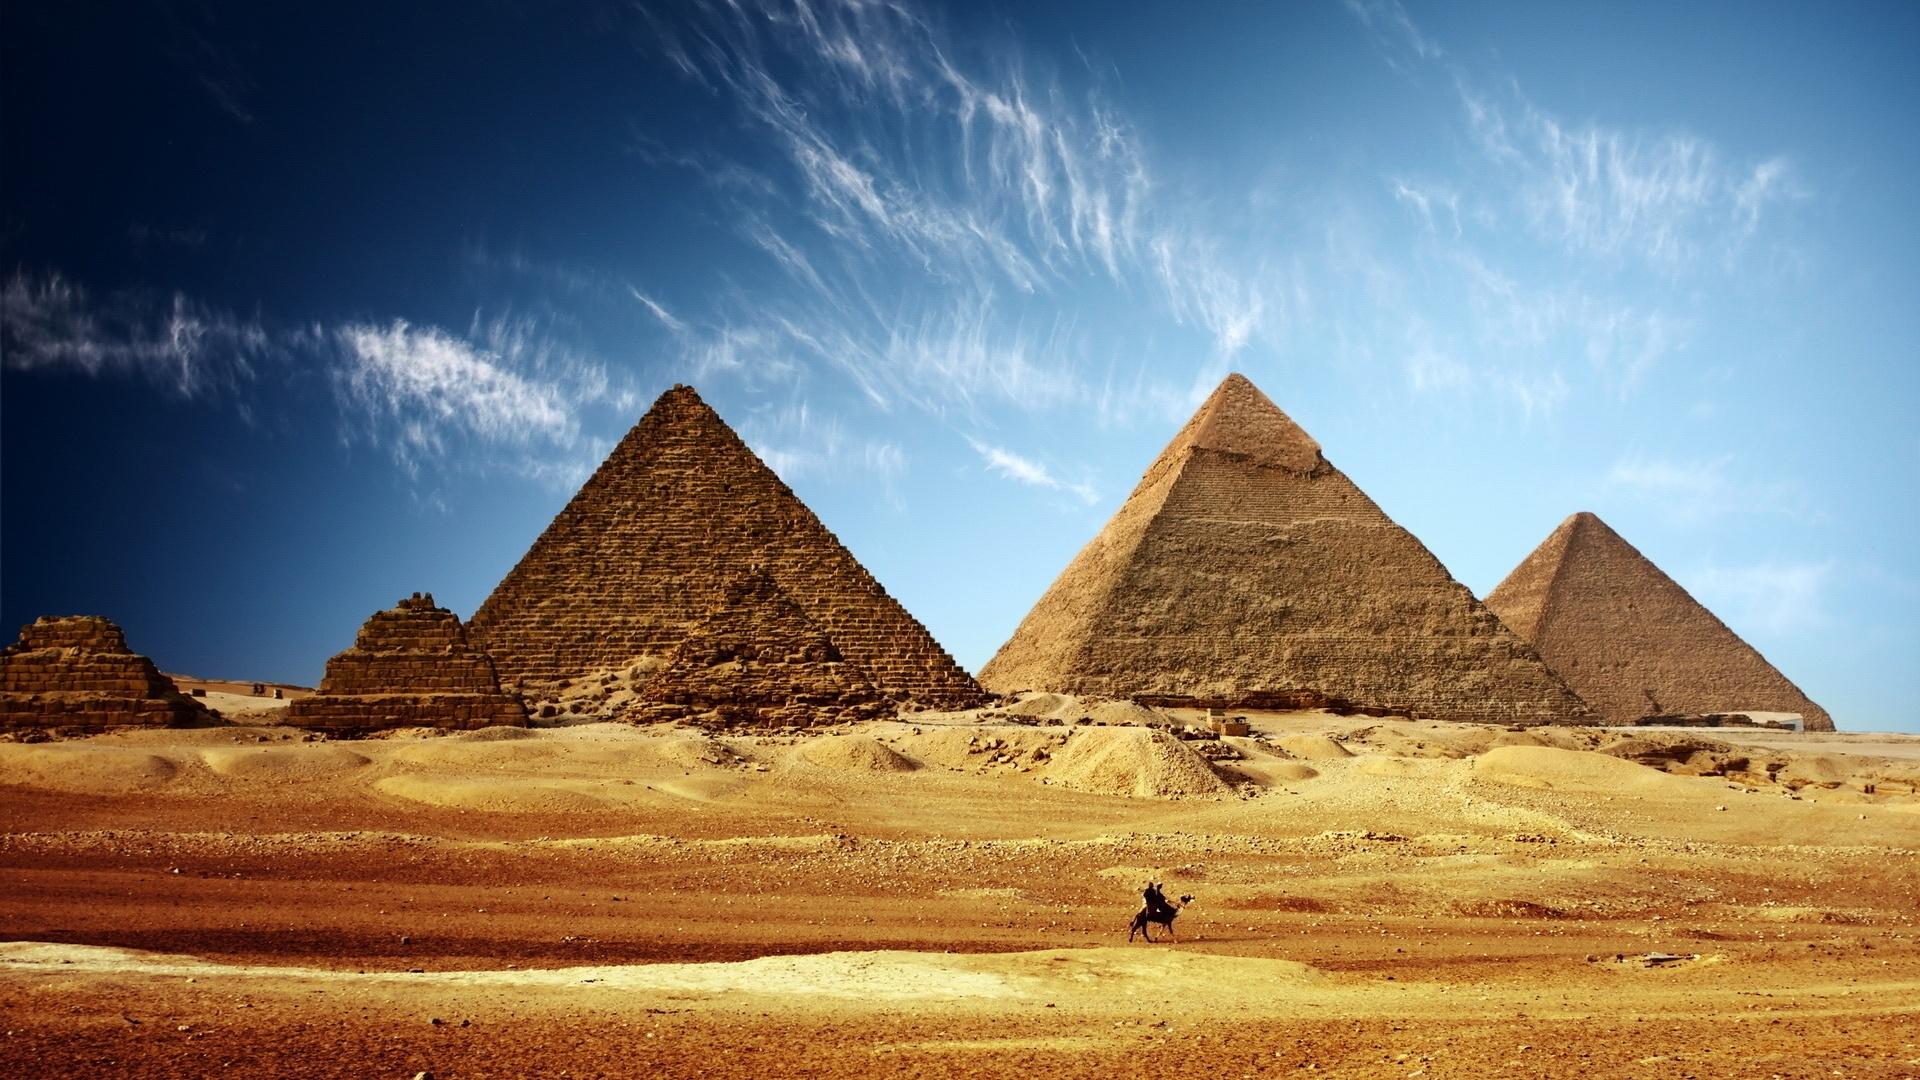 https://techtoday.in.ua/wp-content/uploads/2020/03/7033142-pyramids-egypt-wallpaper.jpg